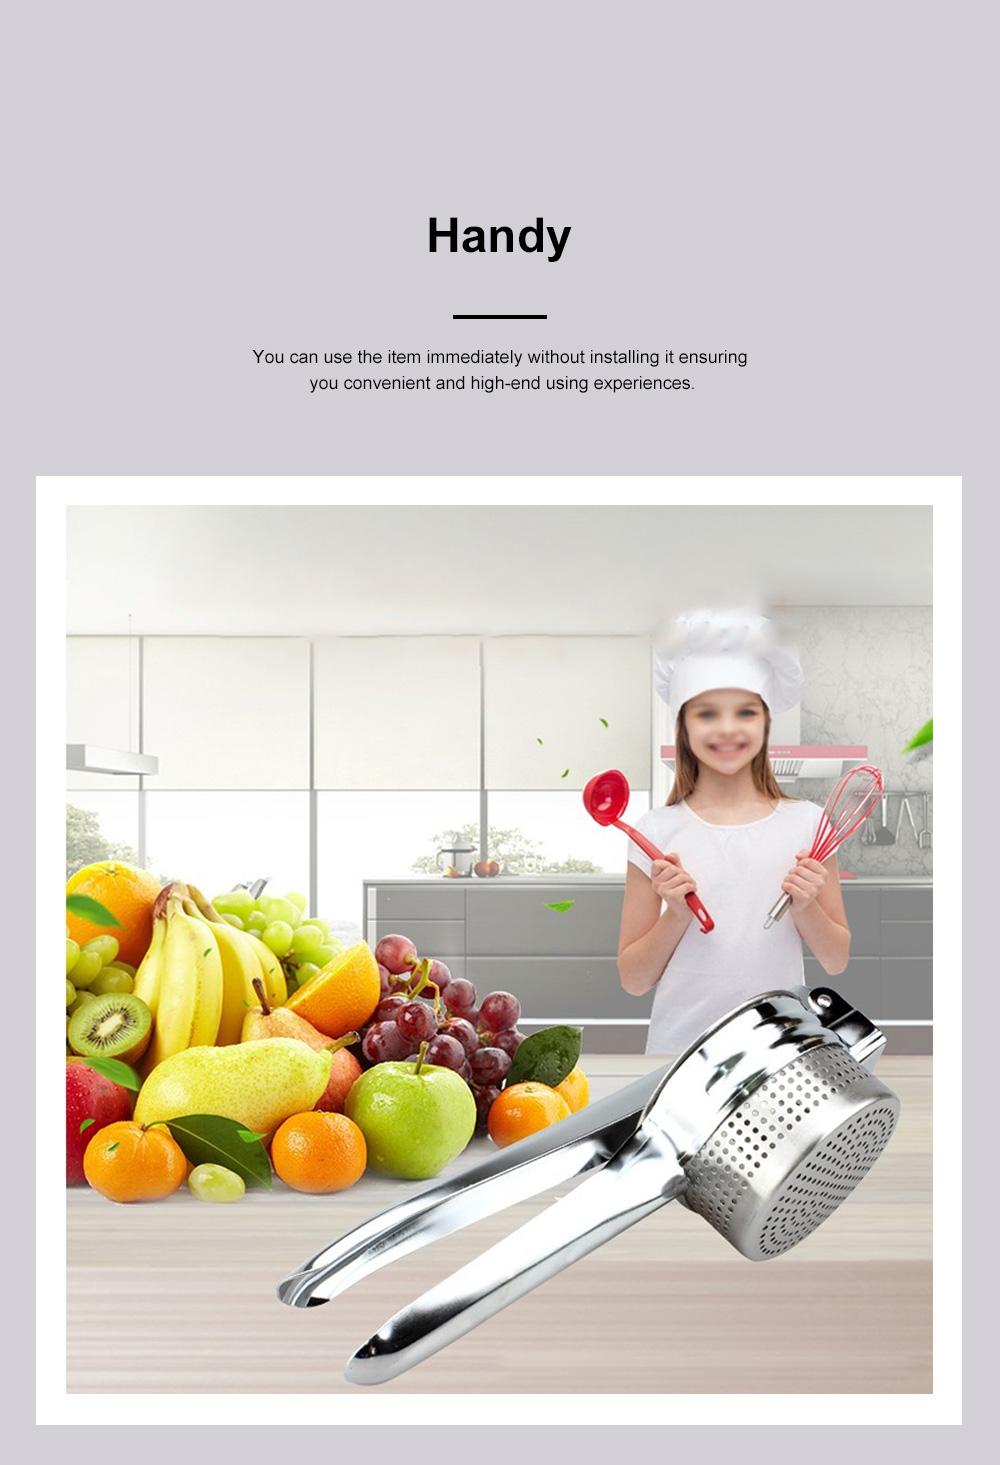 Handy Manual Operation Stainless Steel Juice Extractor Orange Lemon Juicer Garlic Press Kitchen Assistant Tool 2